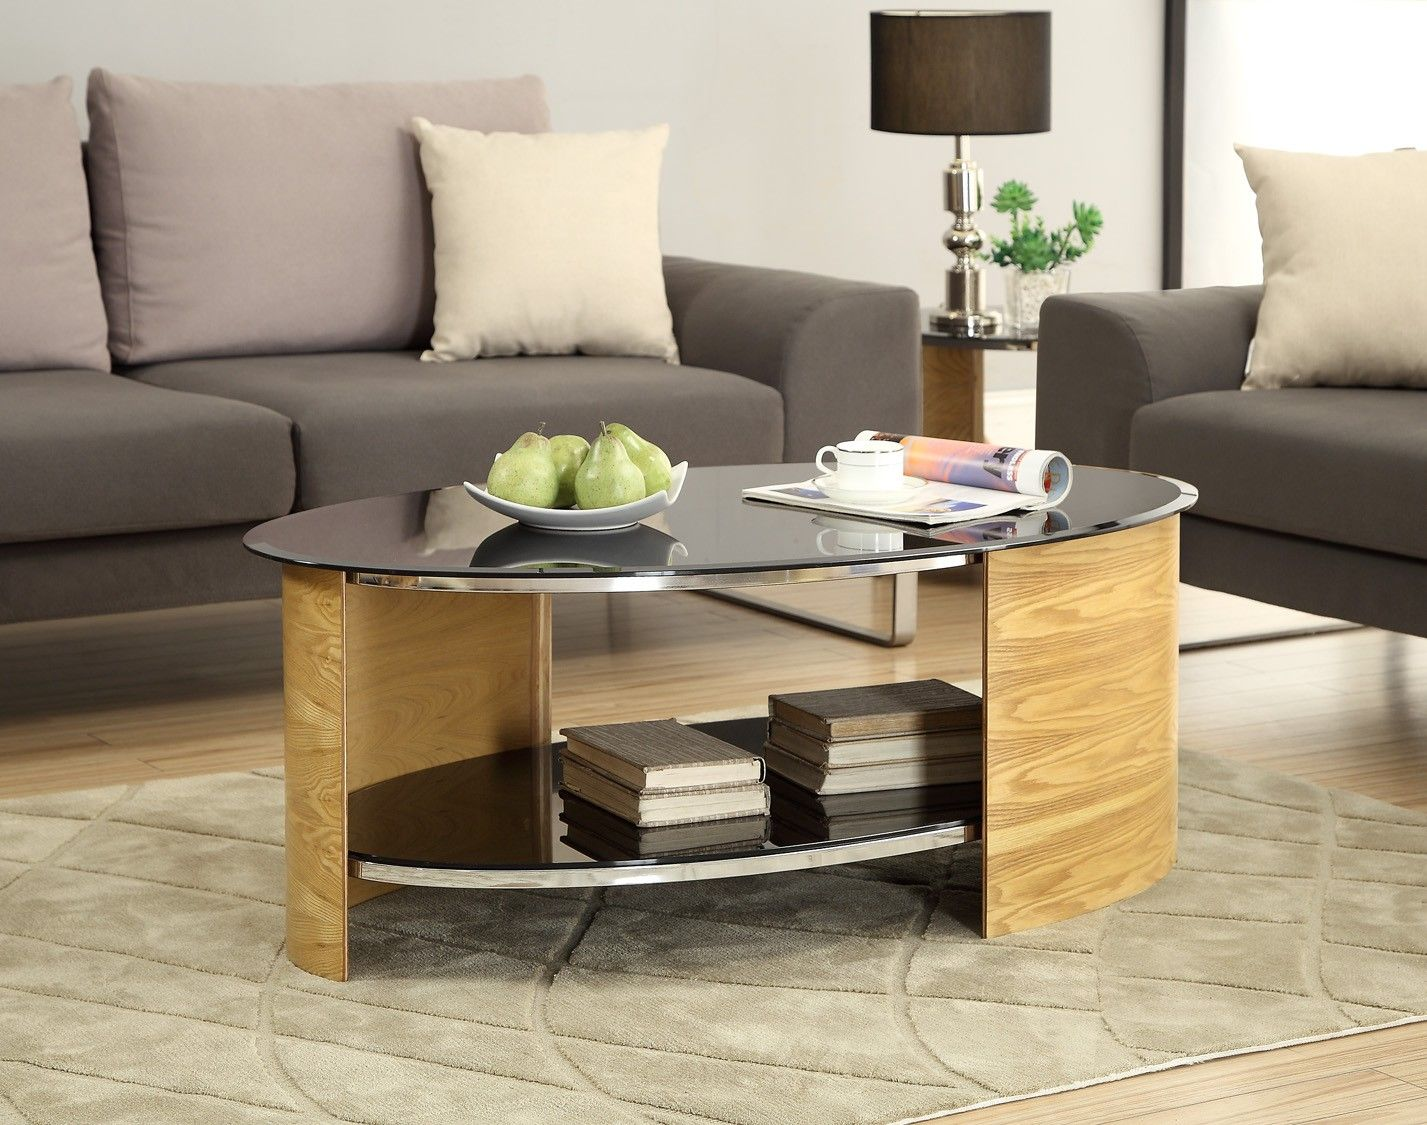 Jual Furnishings Jf301 Oval Coffee Table Oak Add A Sense Of Creativity To Your Livin Coffee Table Coffee Table With Storage Coffee Table Furniture